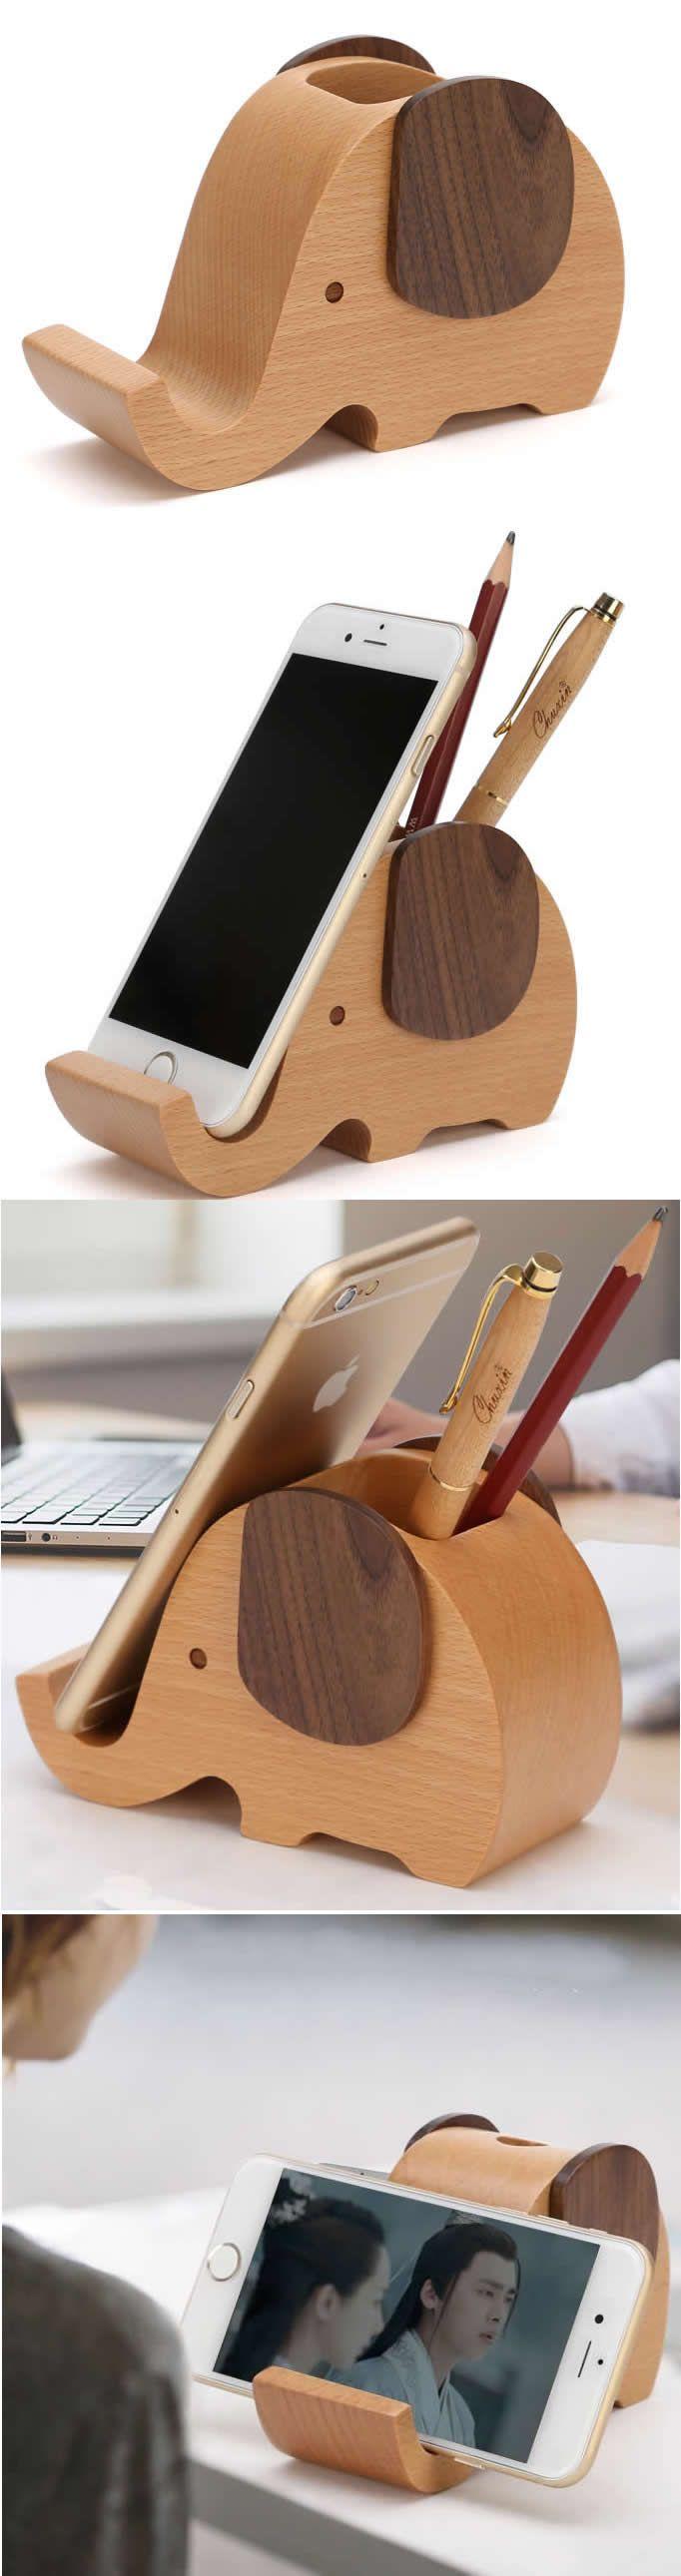 Wooden Elephant Phone Stand Holder Pen Pencil Holder Desk Organizer